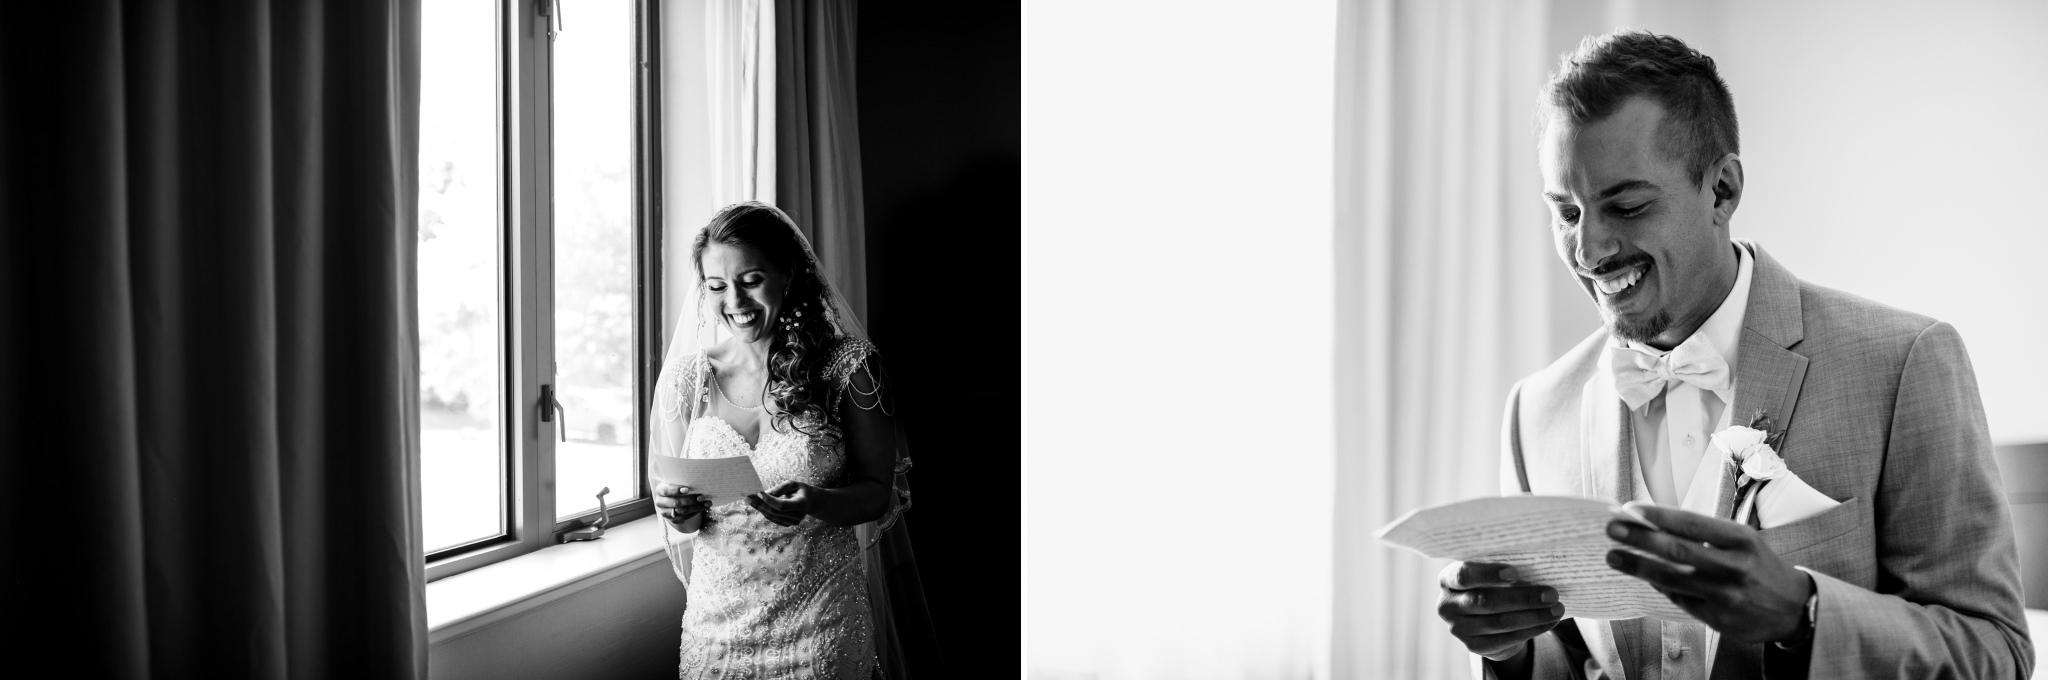 Barbato-Moorestown-Community-House-Wedding-New-Jersey-Photographer-48.JPG